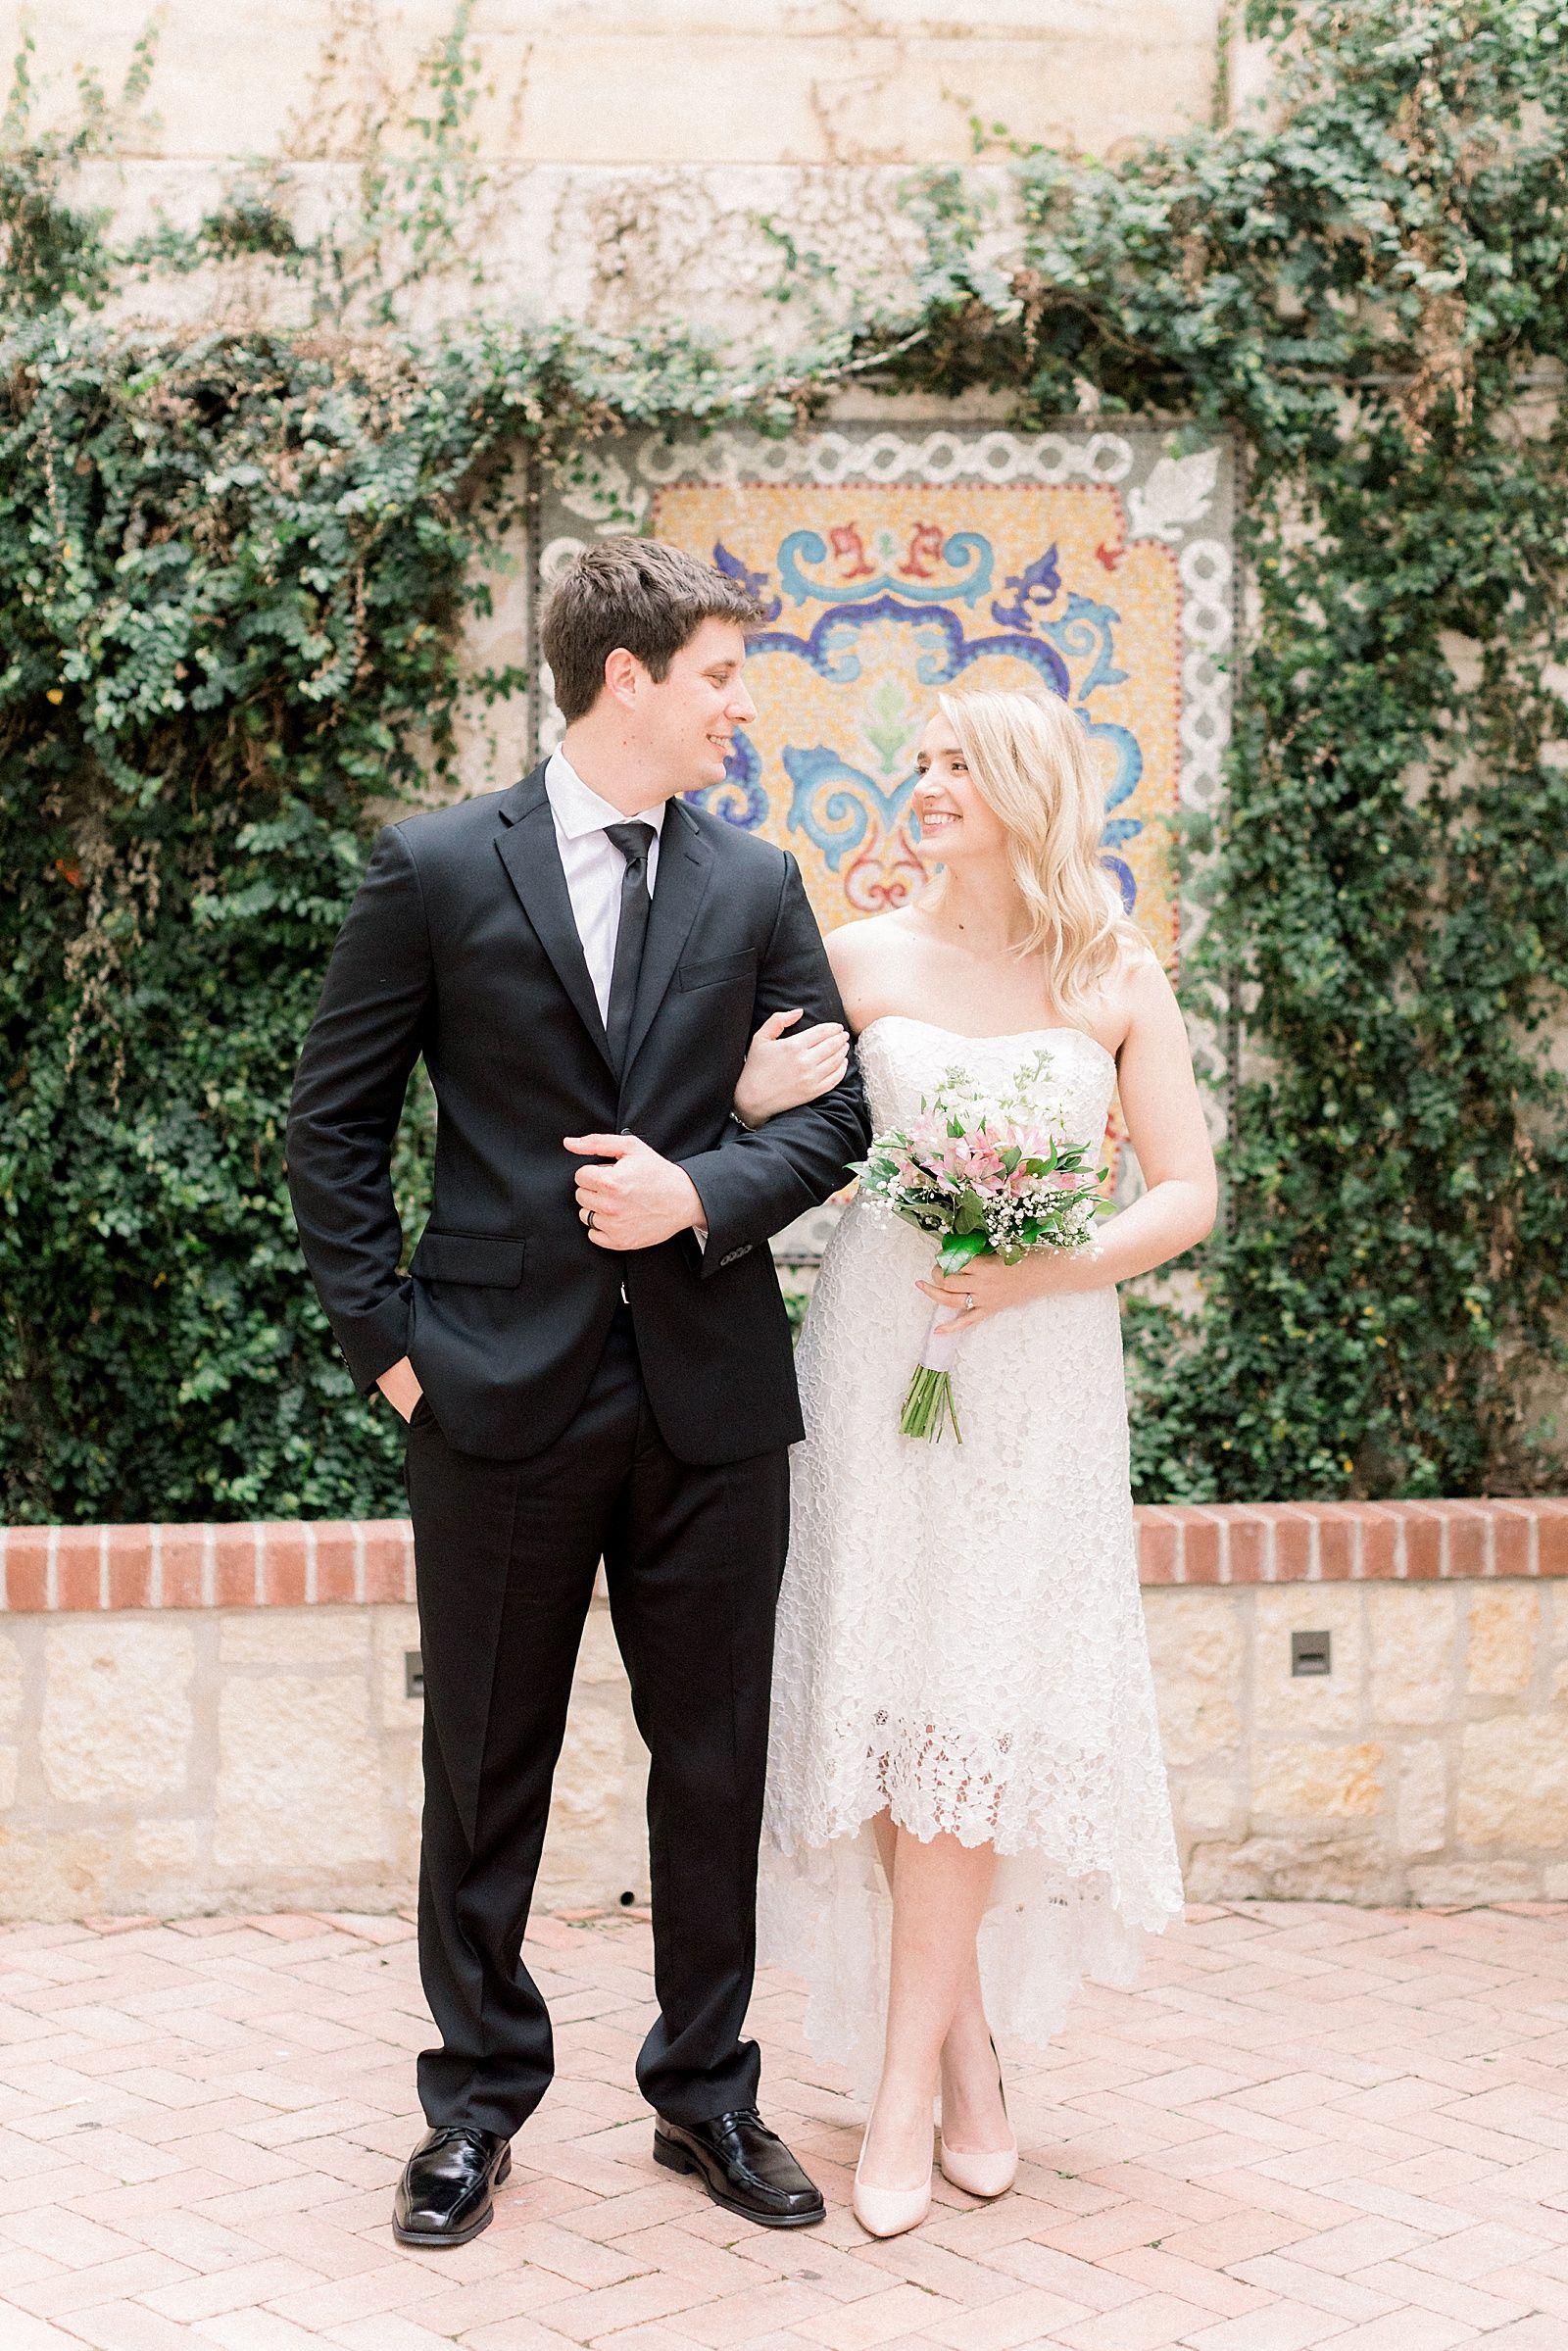 San Antonio Elopement Krenare And Ryan Annakayphotography Net San Antonio Wedding Photographer San Antonio Wedding Photography San Antonio Weddings [ 2399 x 1600 Pixel ]